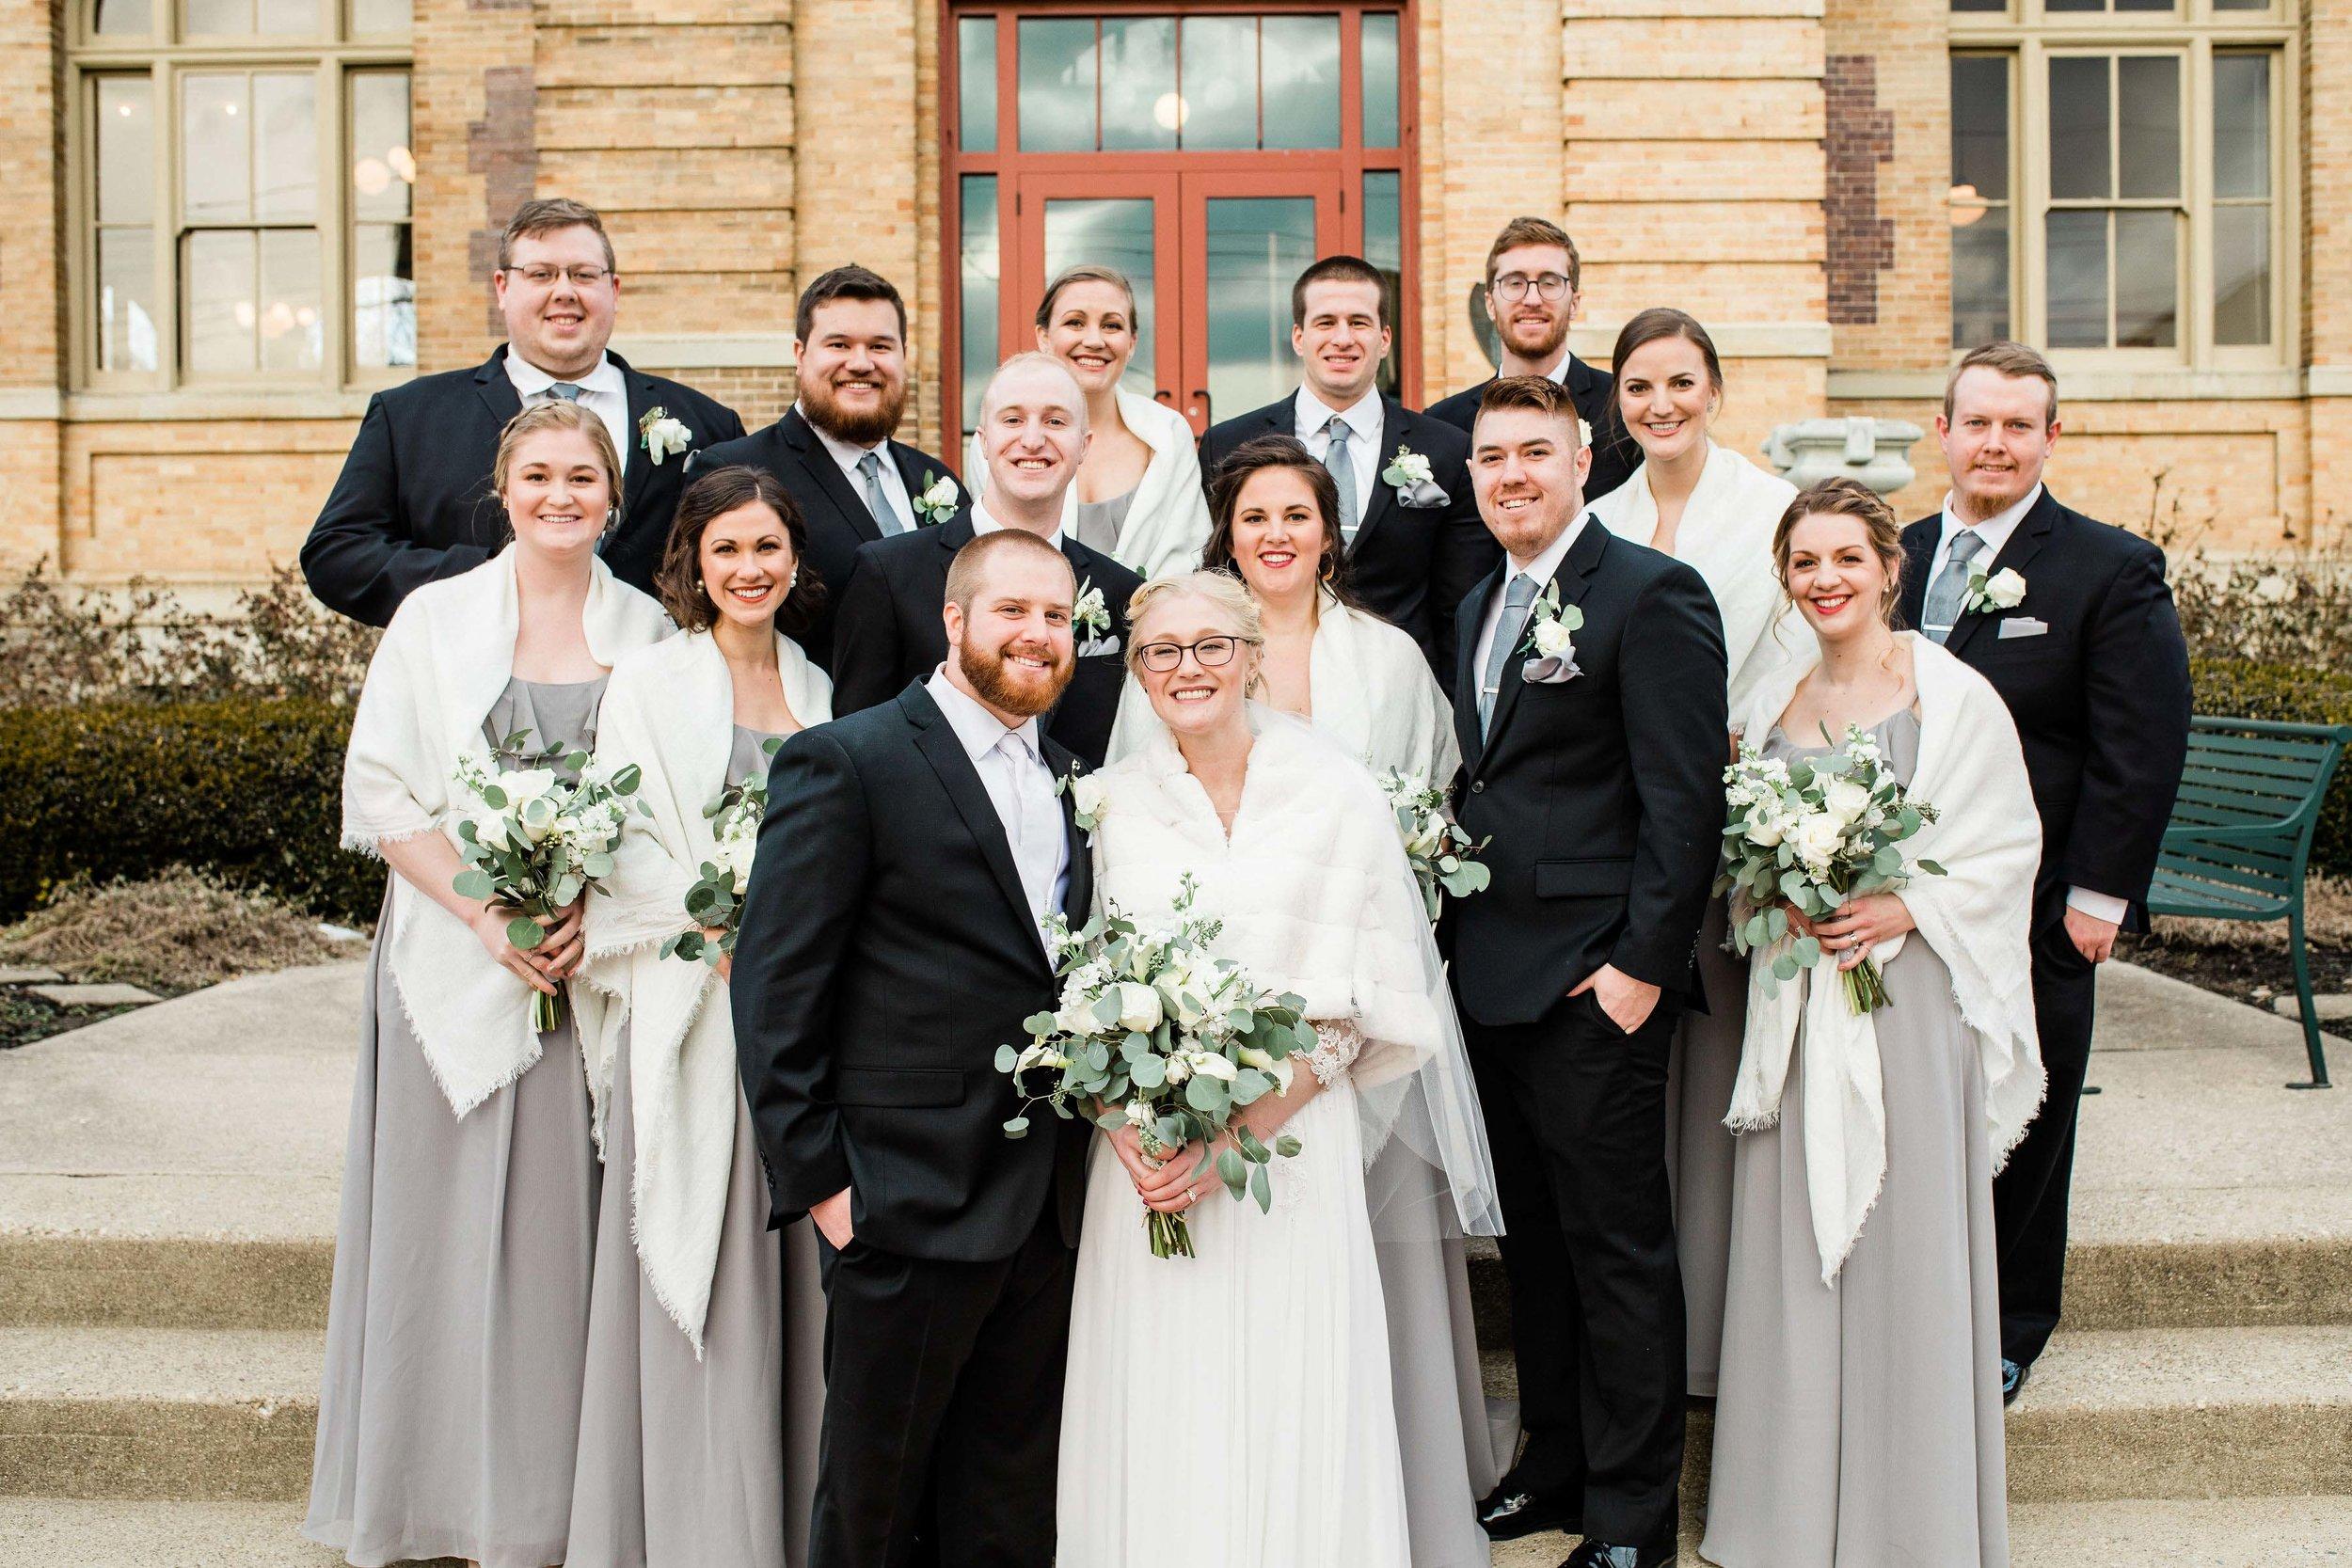 wedding photographer near me ohio-2.jpg